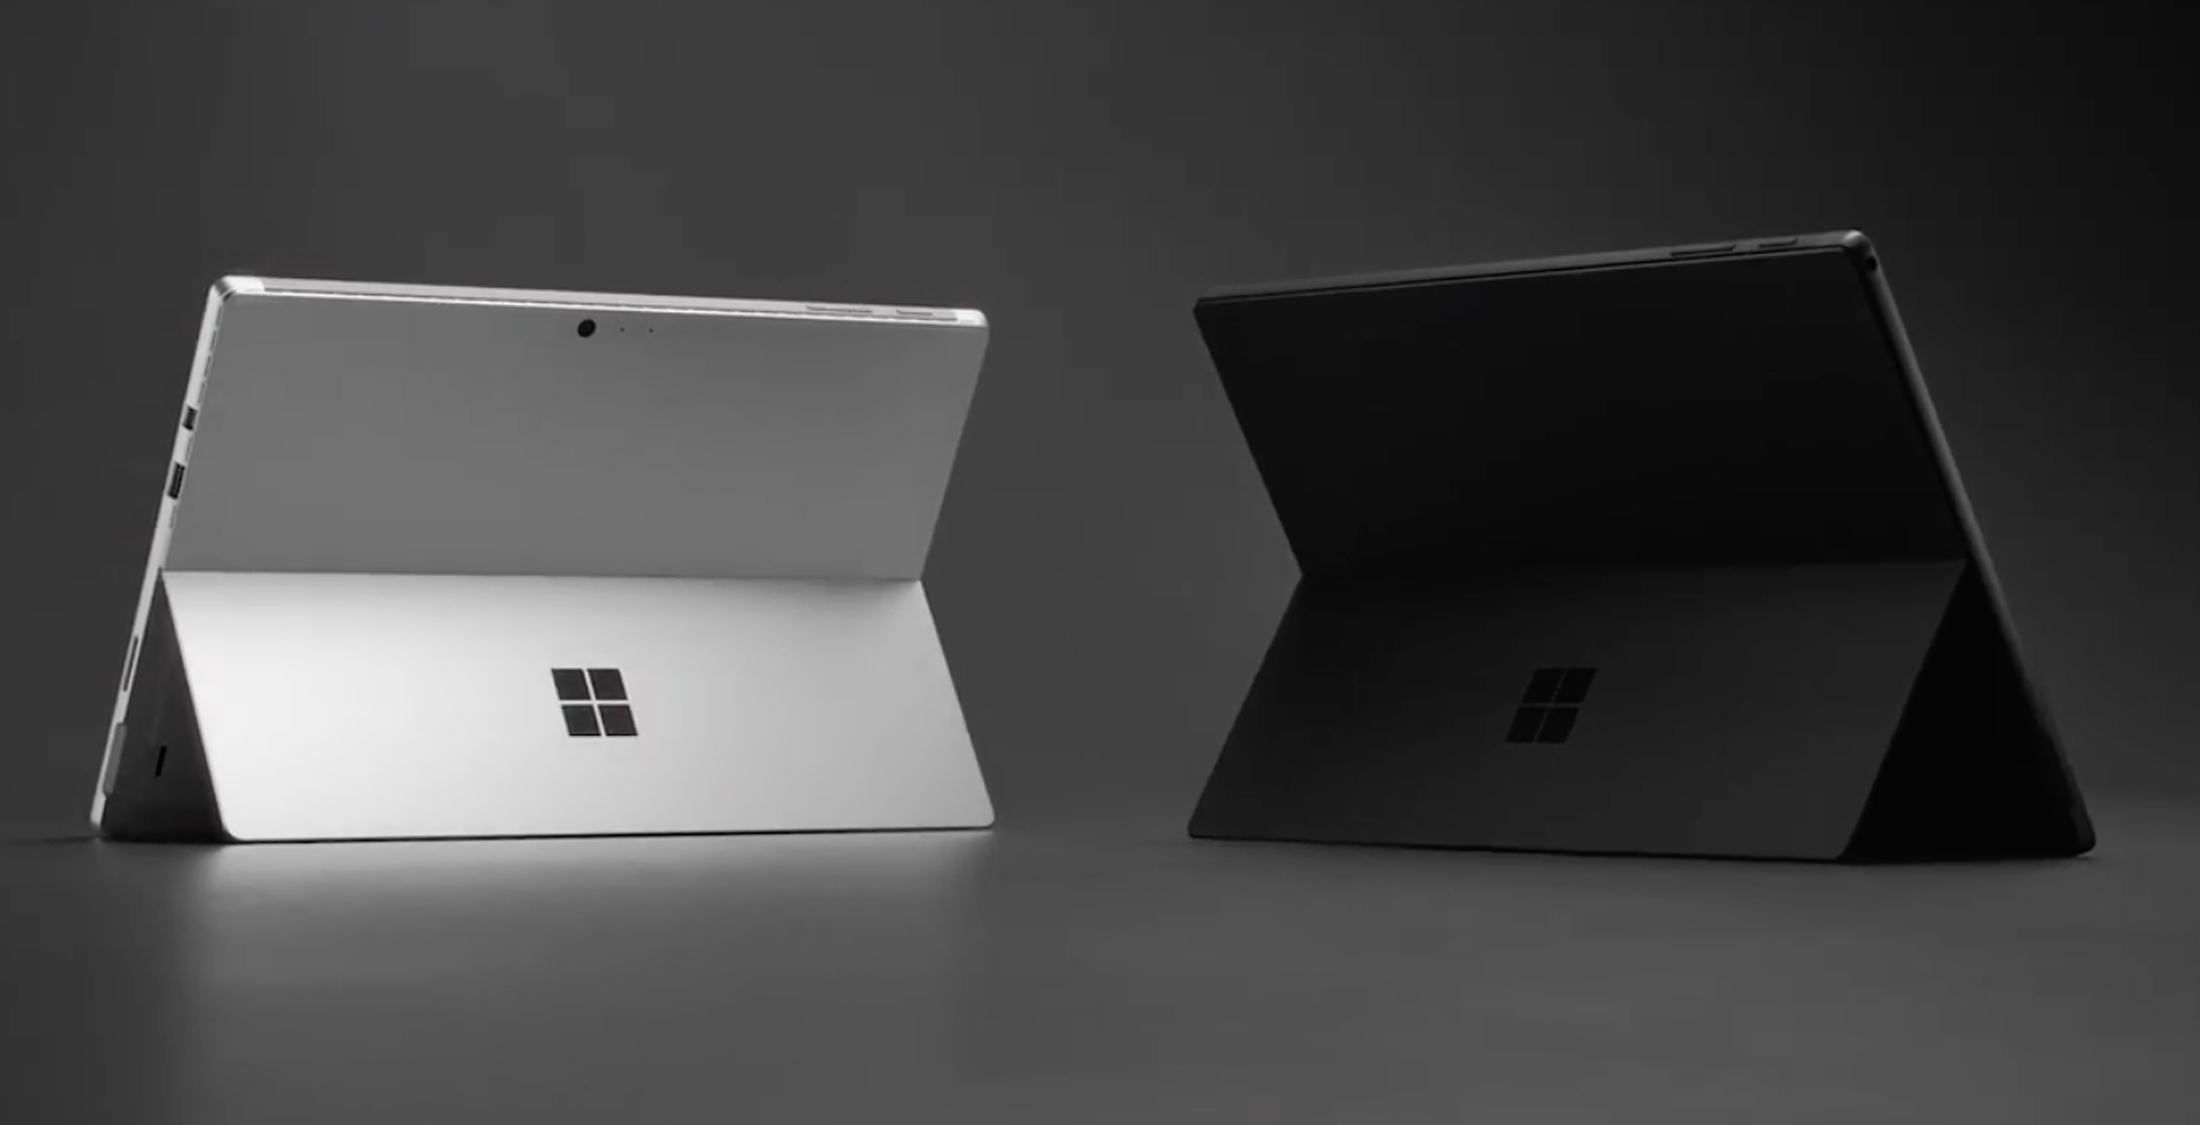 Surface_Pro_6.jpg?1591592860004